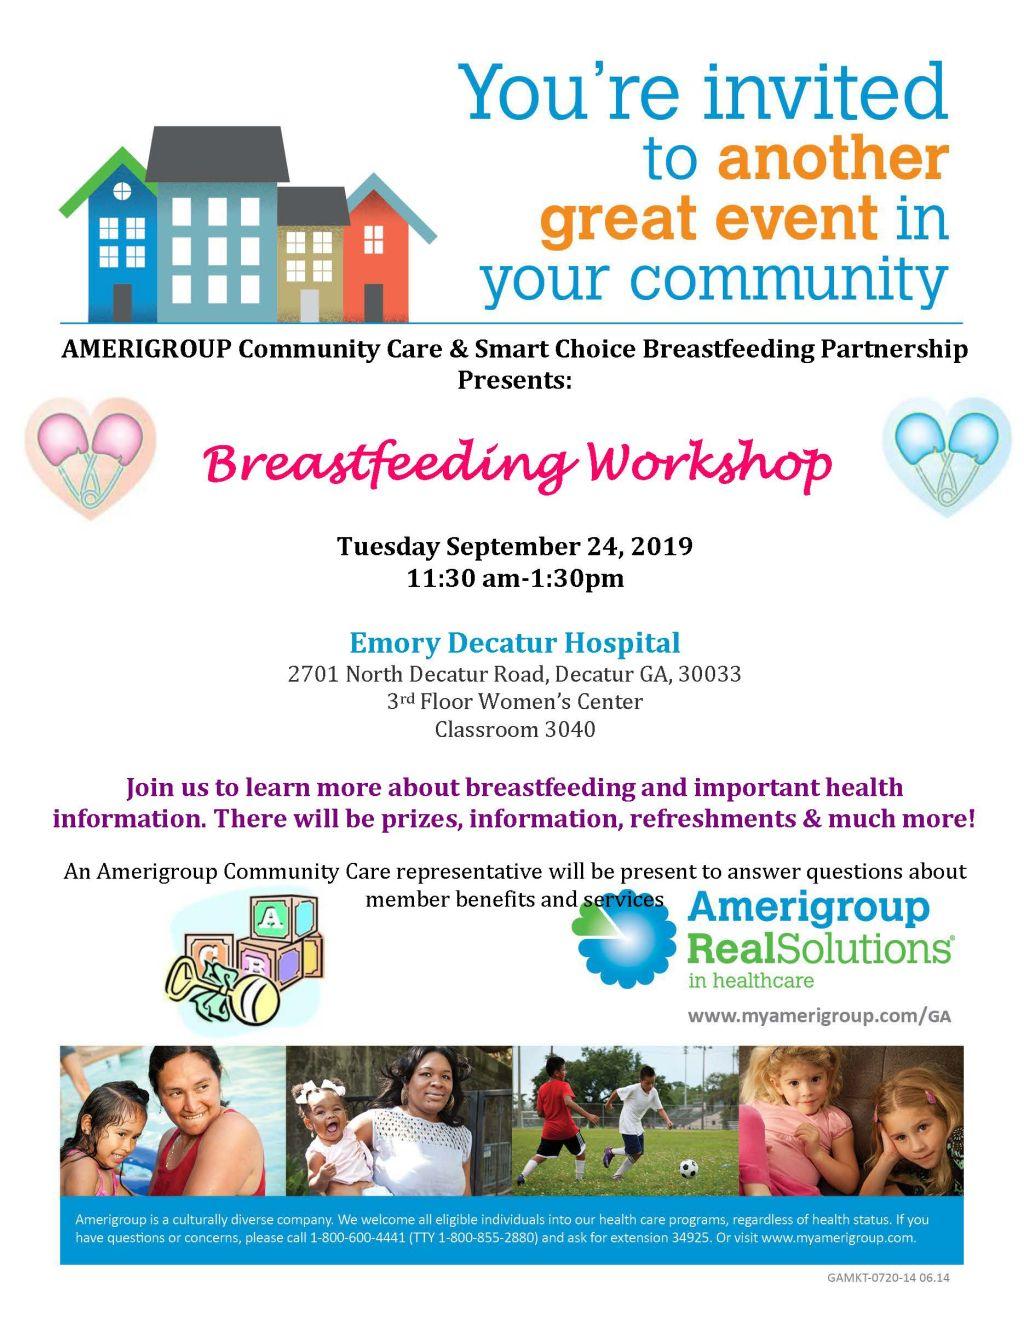 Amerigroup Community Care Presents: Breastfeeding Workshop